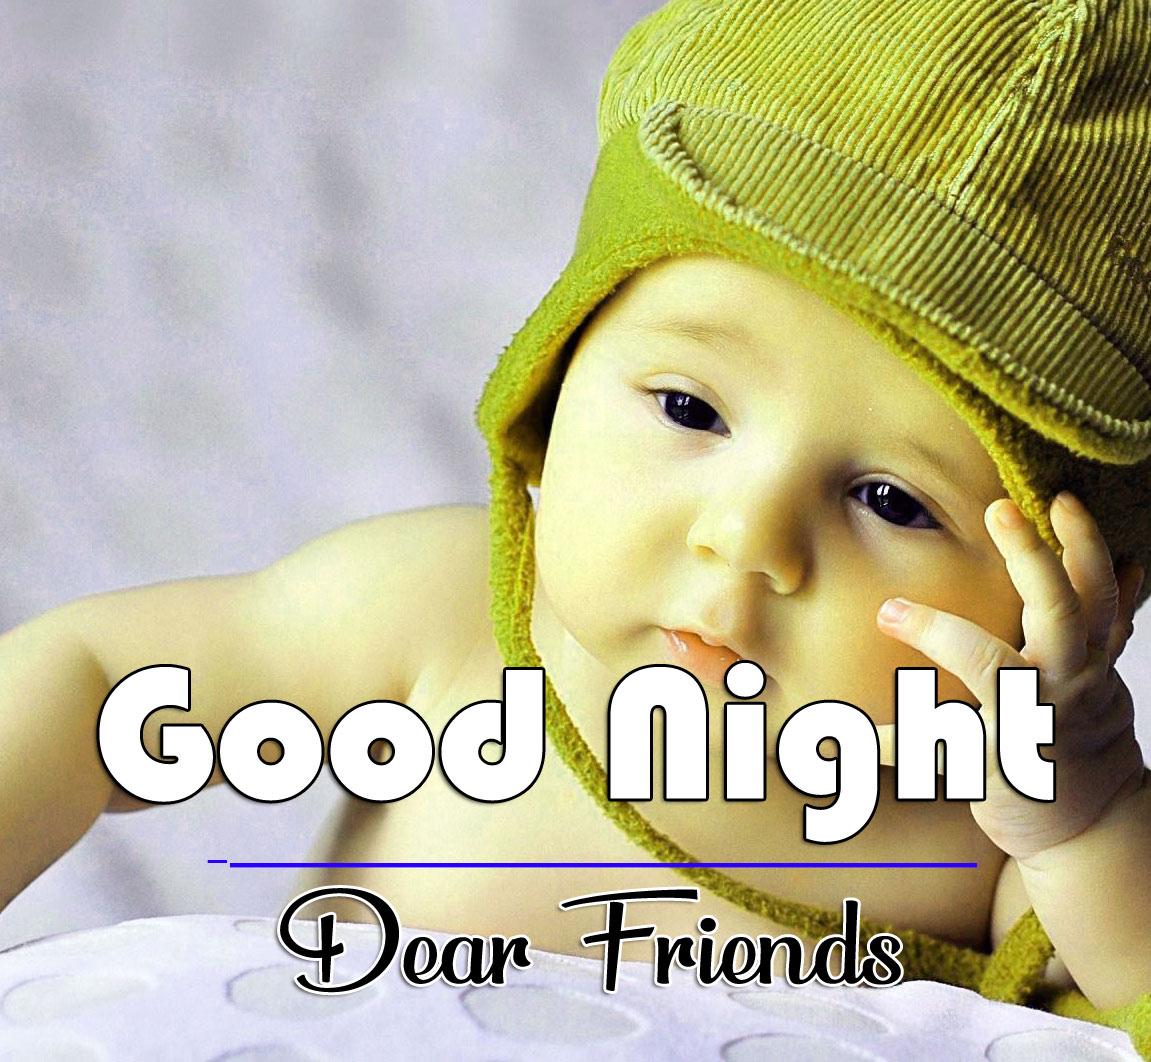 HD Good Night Pics Free Download